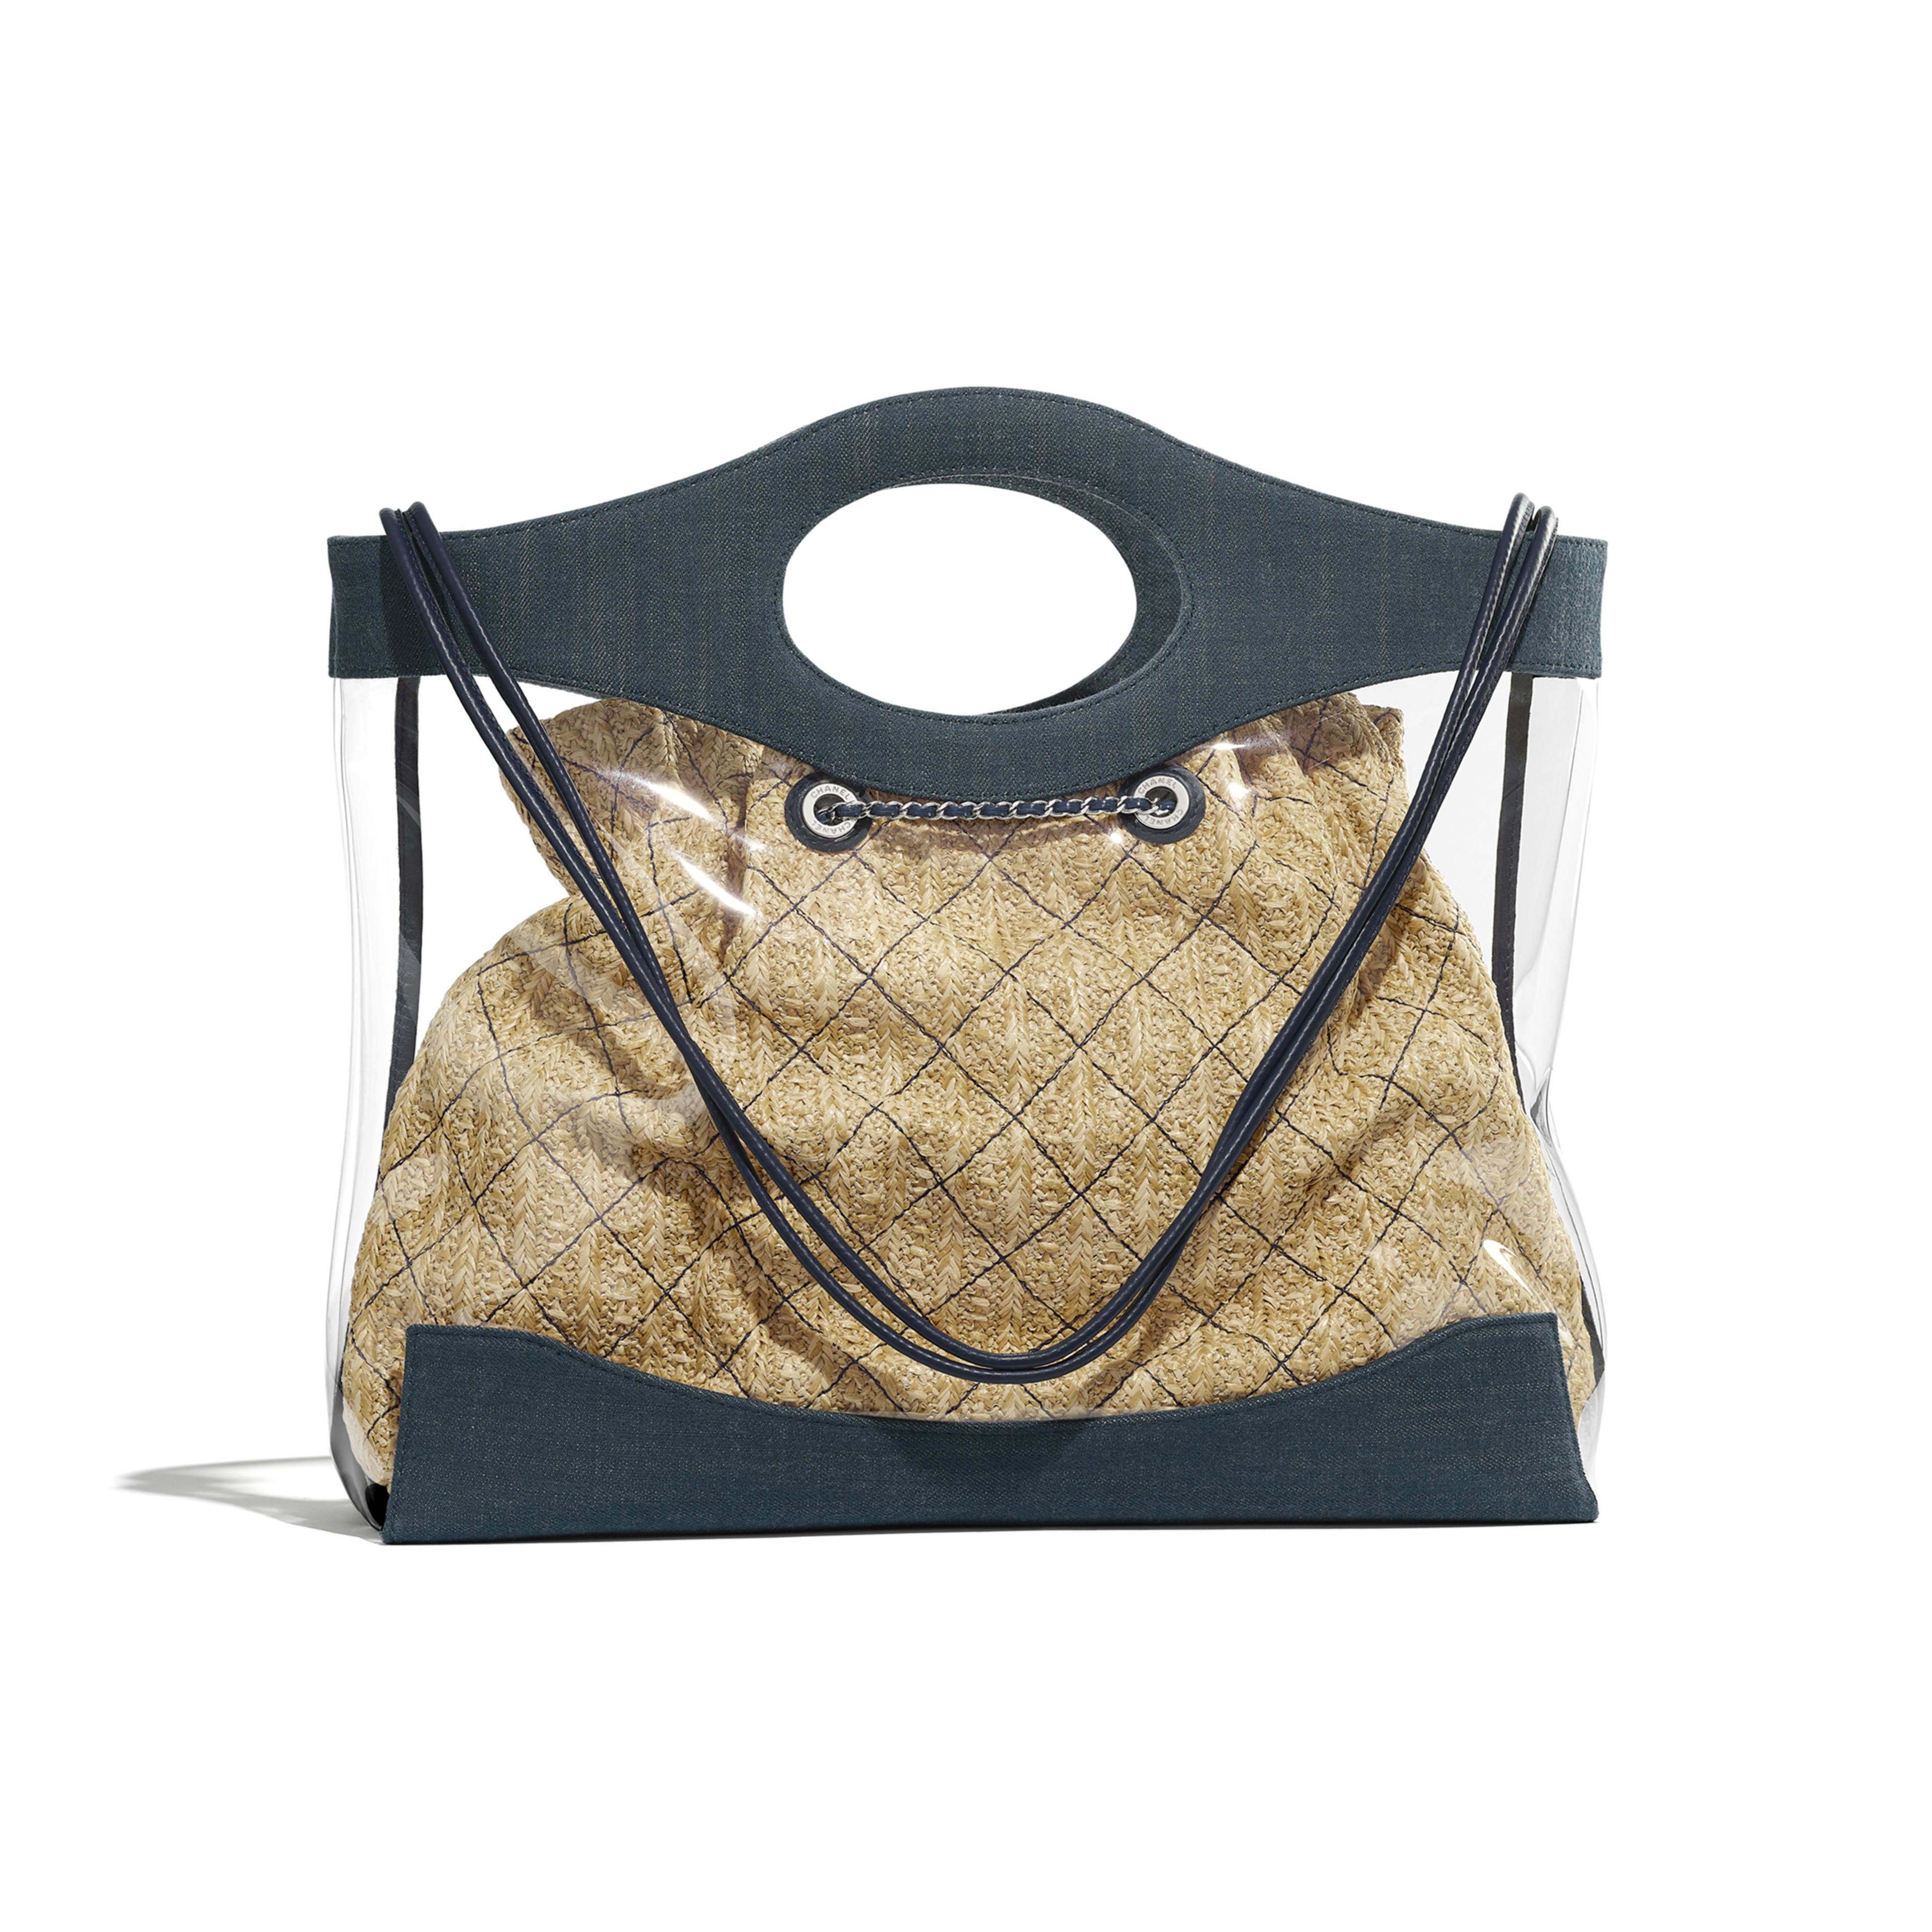 CHANEL 31 Shopping Bag - Blue - PVC, Denim, Calfskin & Silver-Tone Metal - Alternative view - see full sized version